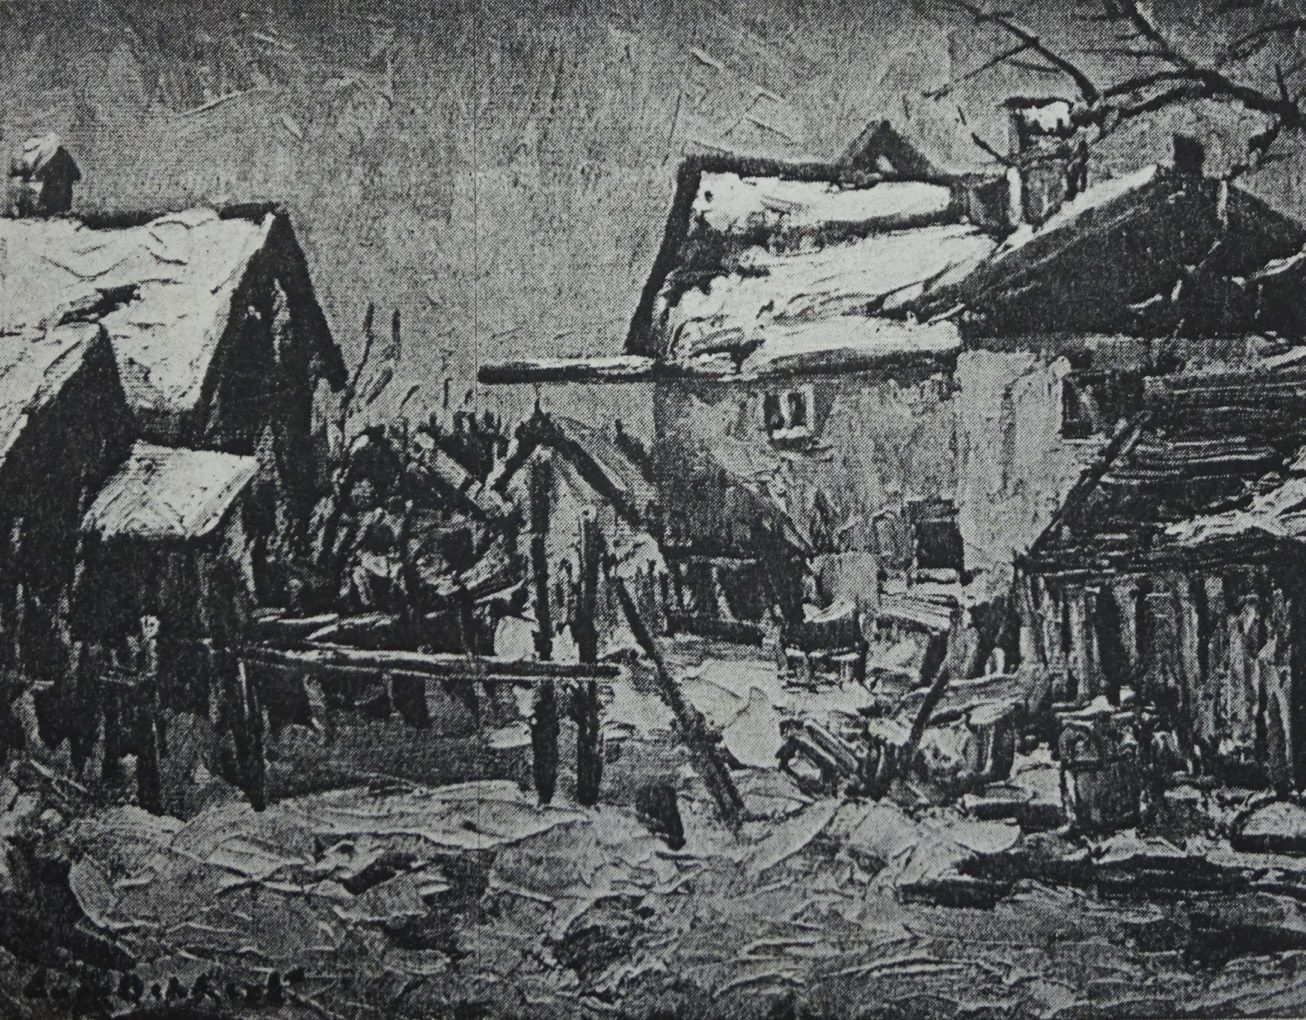 "Chłopskie domy w Diessen, nie datowany, olej na płótnie, reprodukcja w: Otto Holtze, Eugen Dekkert. Zum 70. Geburtstag des Stettiner Malers, ""Bollwerk"" 1935, s. 296."